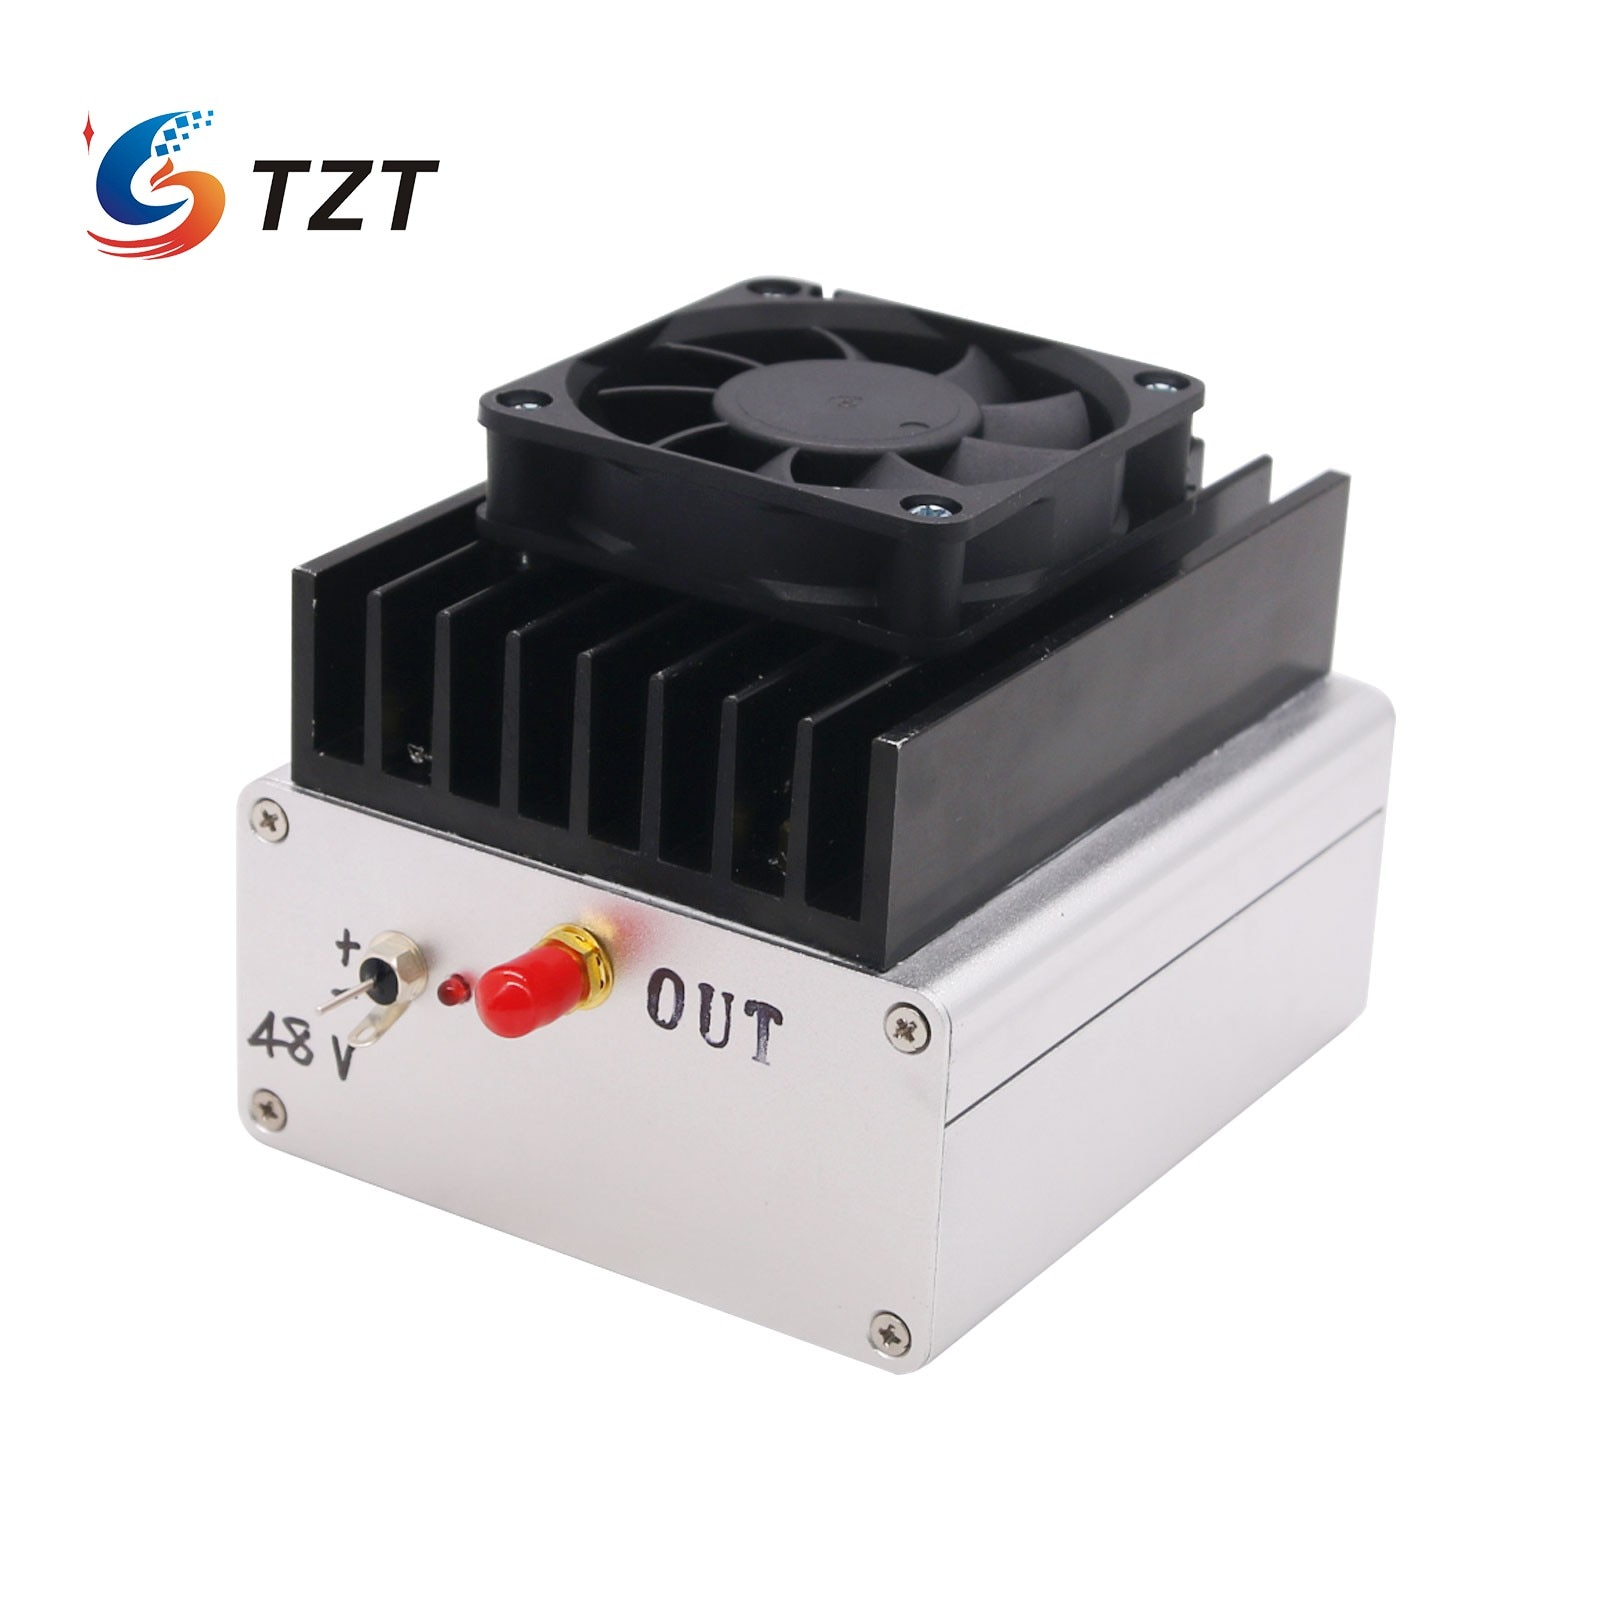 TZT 100kHz-3MHz 50 واط متوسطة طويلة موجة HF RF النطاق العريض مكبر كهربائي أمبير